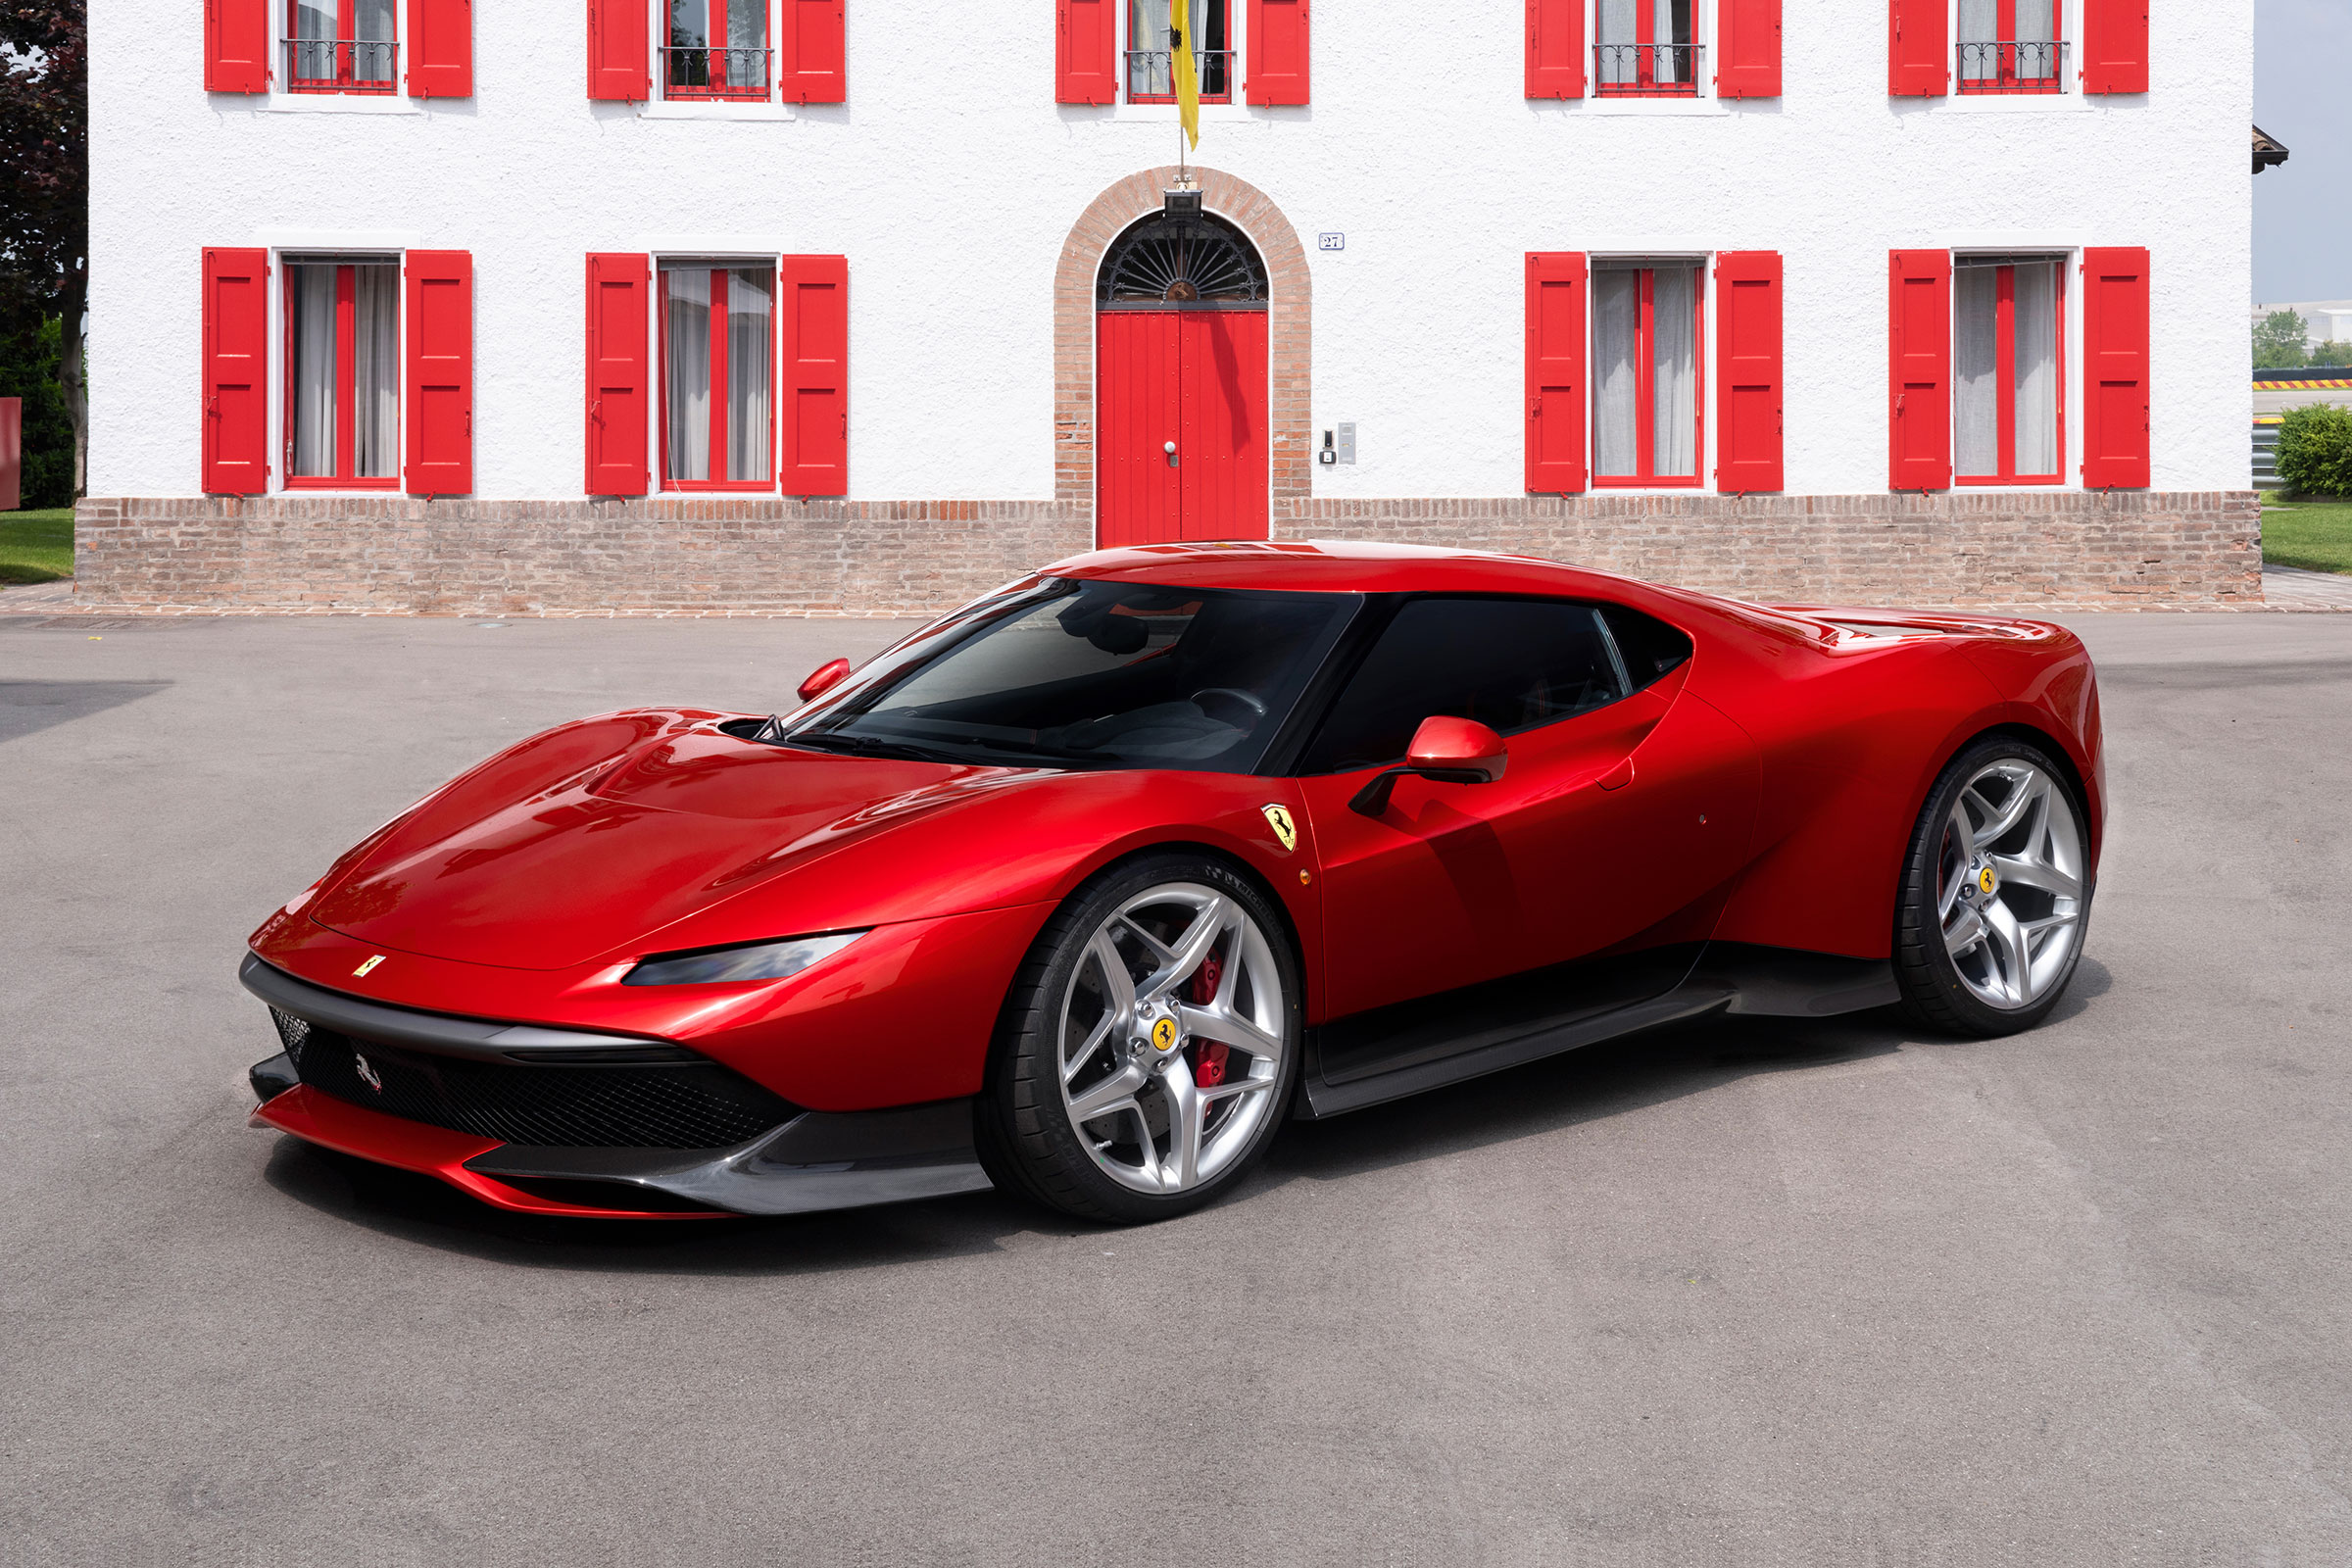 New Ferrari Sp38 One Off Supercar Revealed Evo